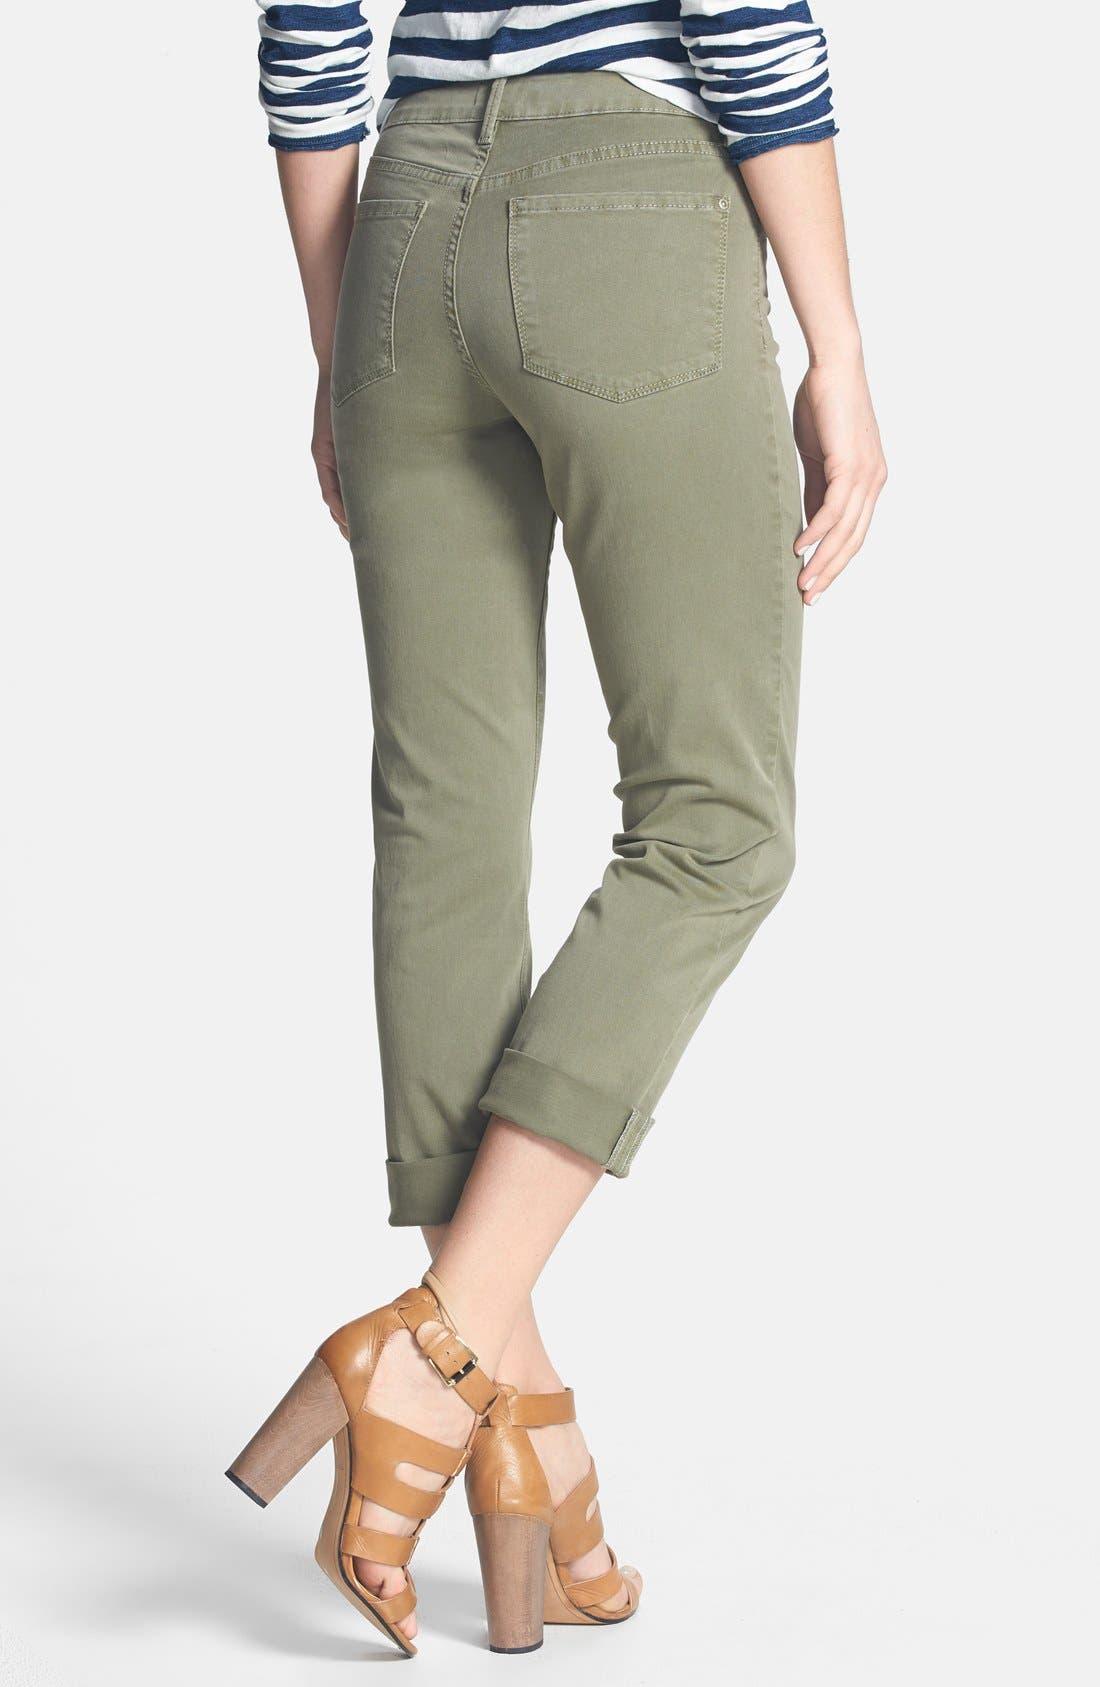 Alternate Image 2  - NYDJ 'Bobbie' Stretch Boyfriend Jeans (Fennel) (Regular & Petite)